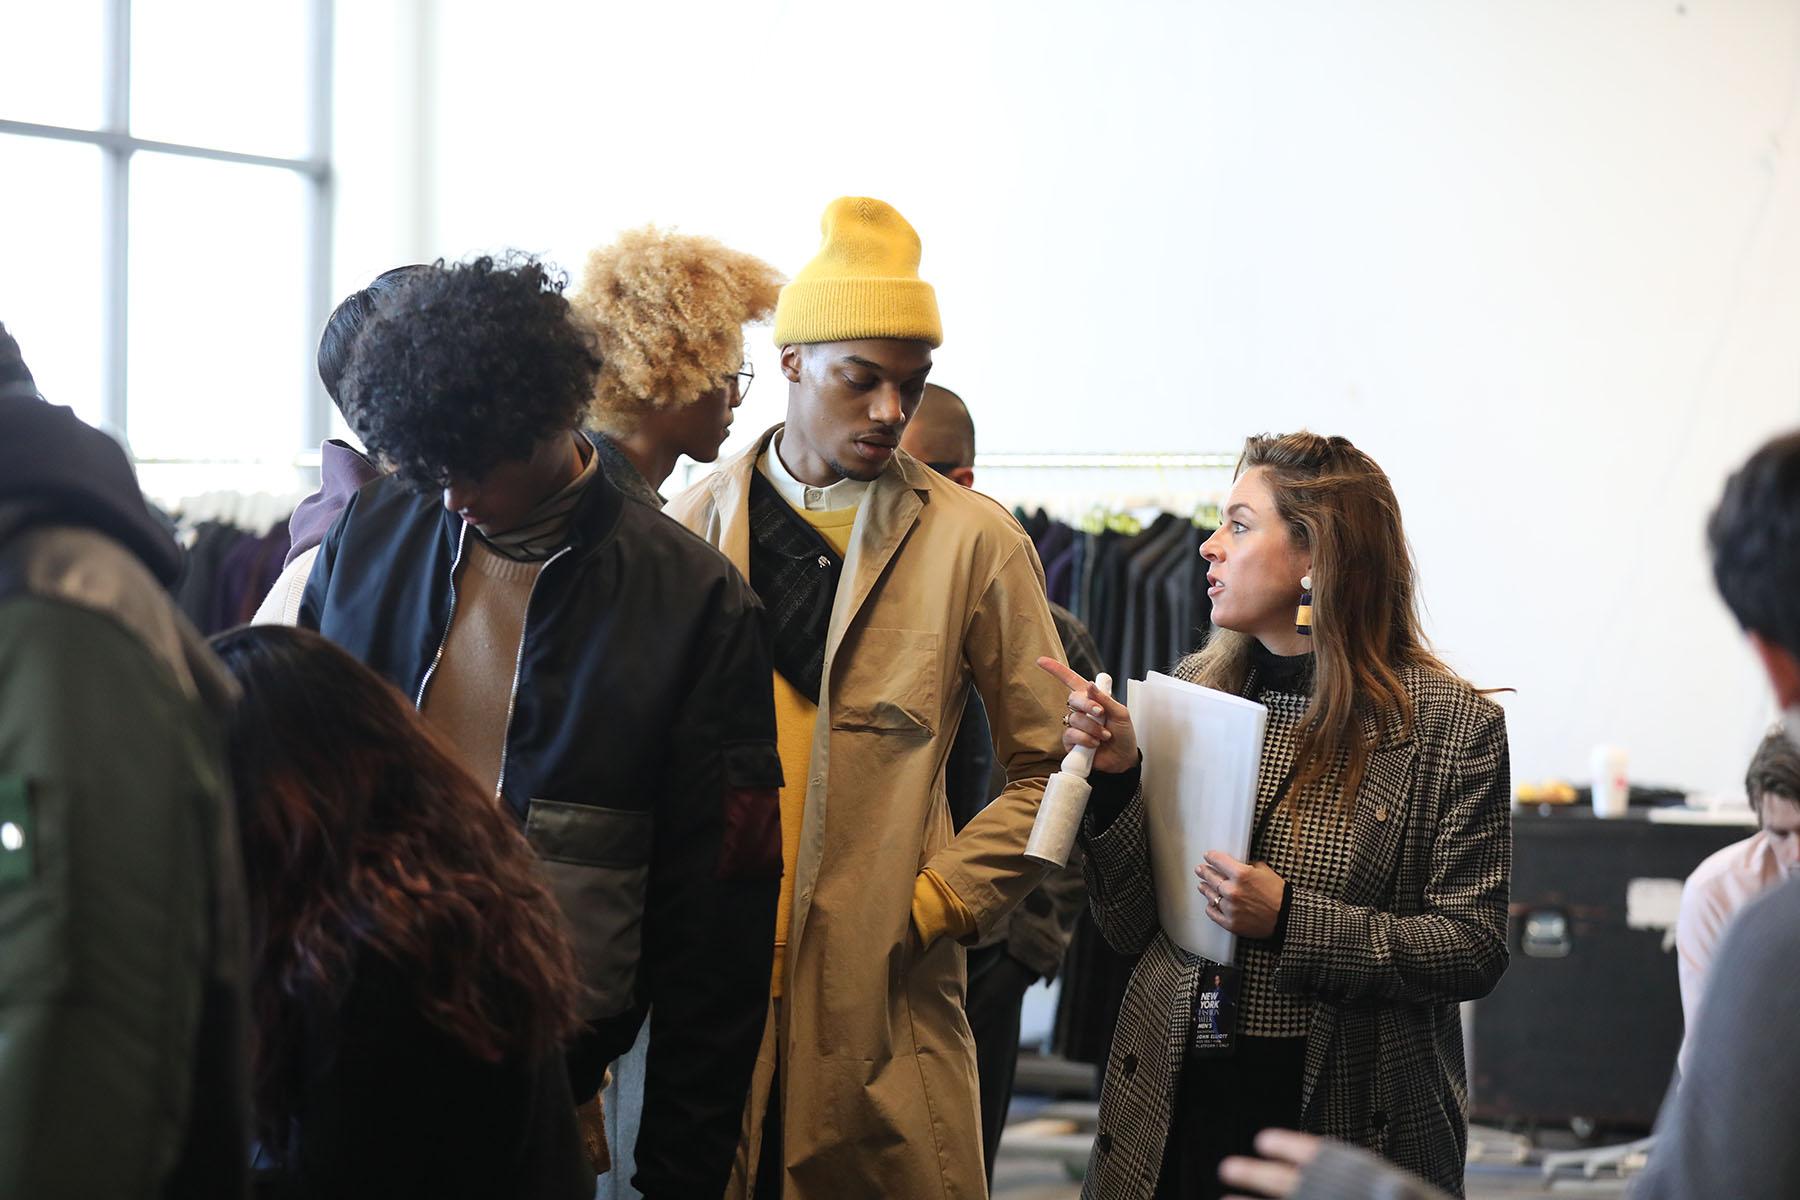 John-Elliott-Fall-2017-mens-fashion-show-backstage-the-impression-102